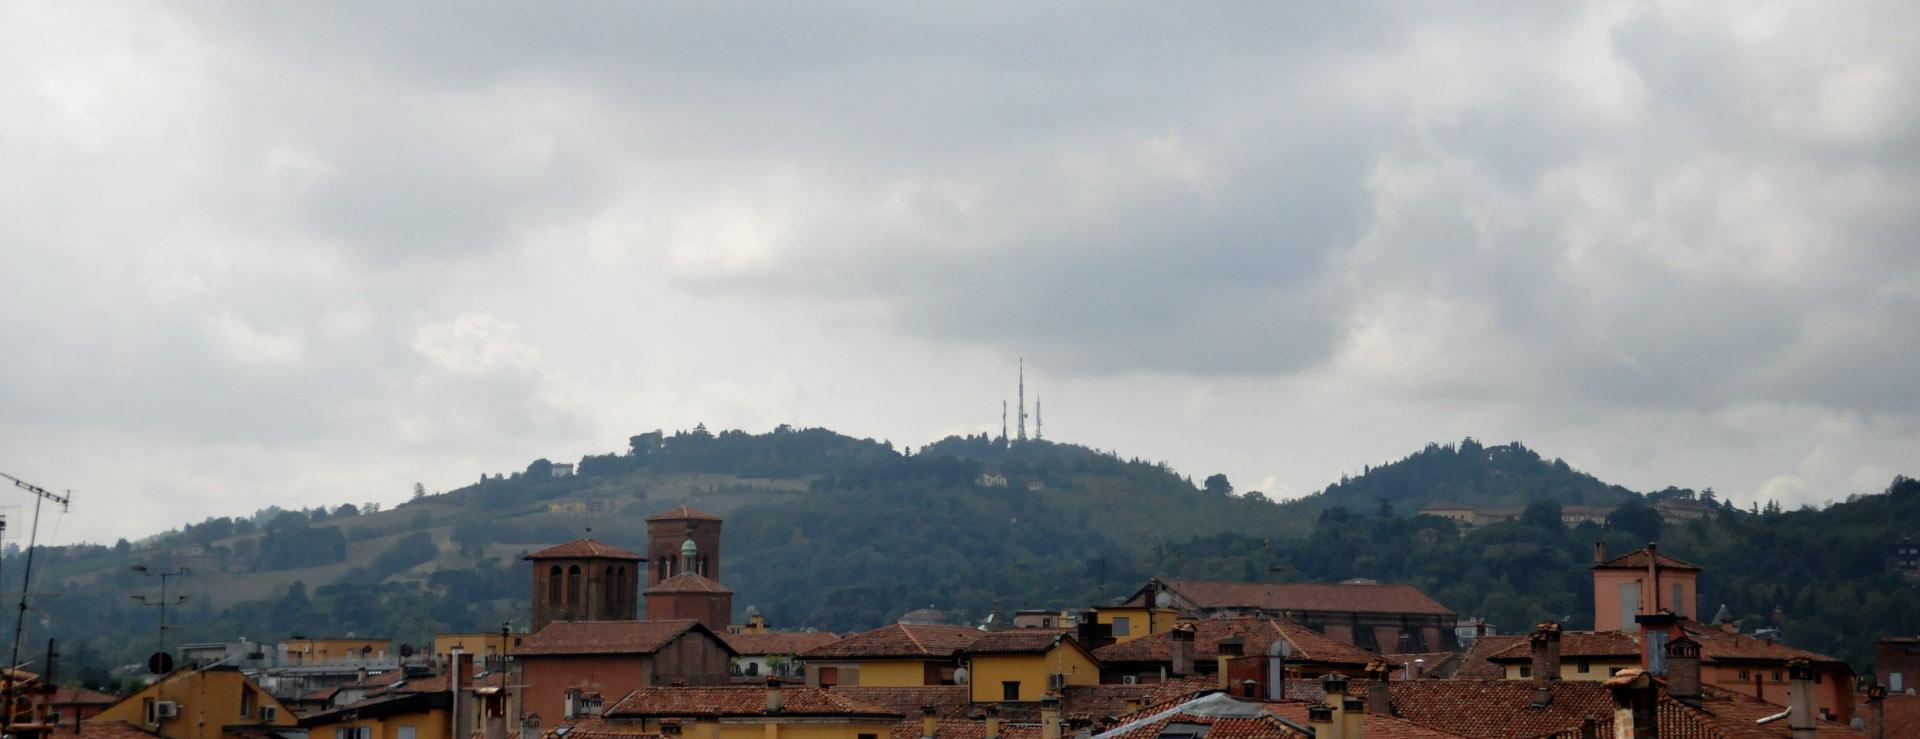 Foto: Cielo sopra Bologna - Archivio Città metropolitana